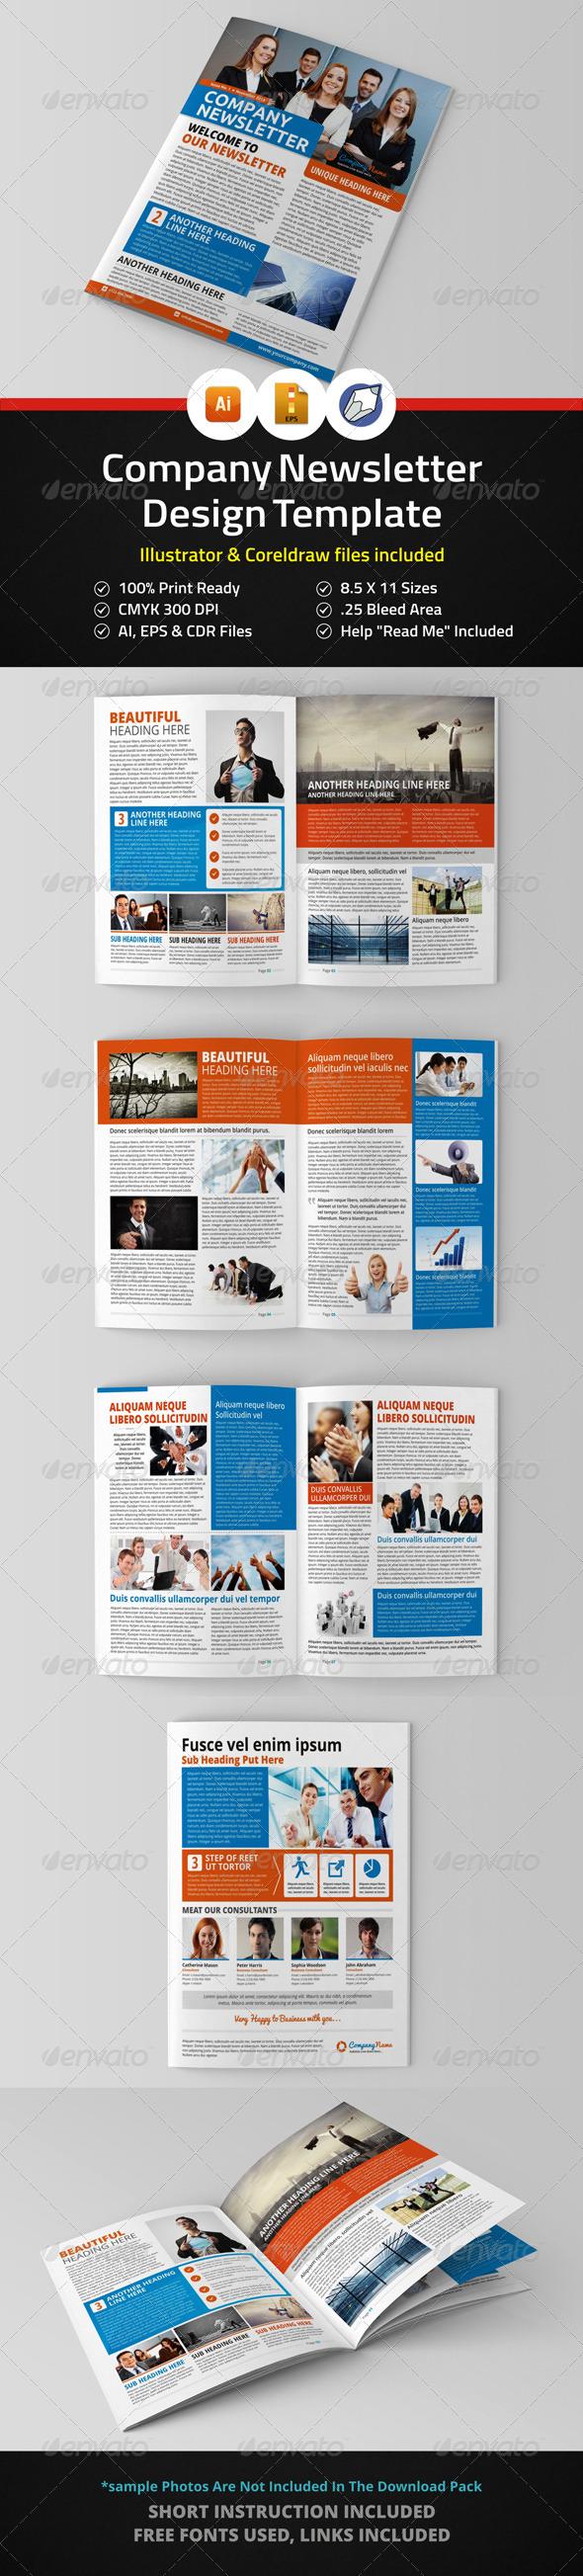 GraphicRiver Newsletter Design Template 5959660